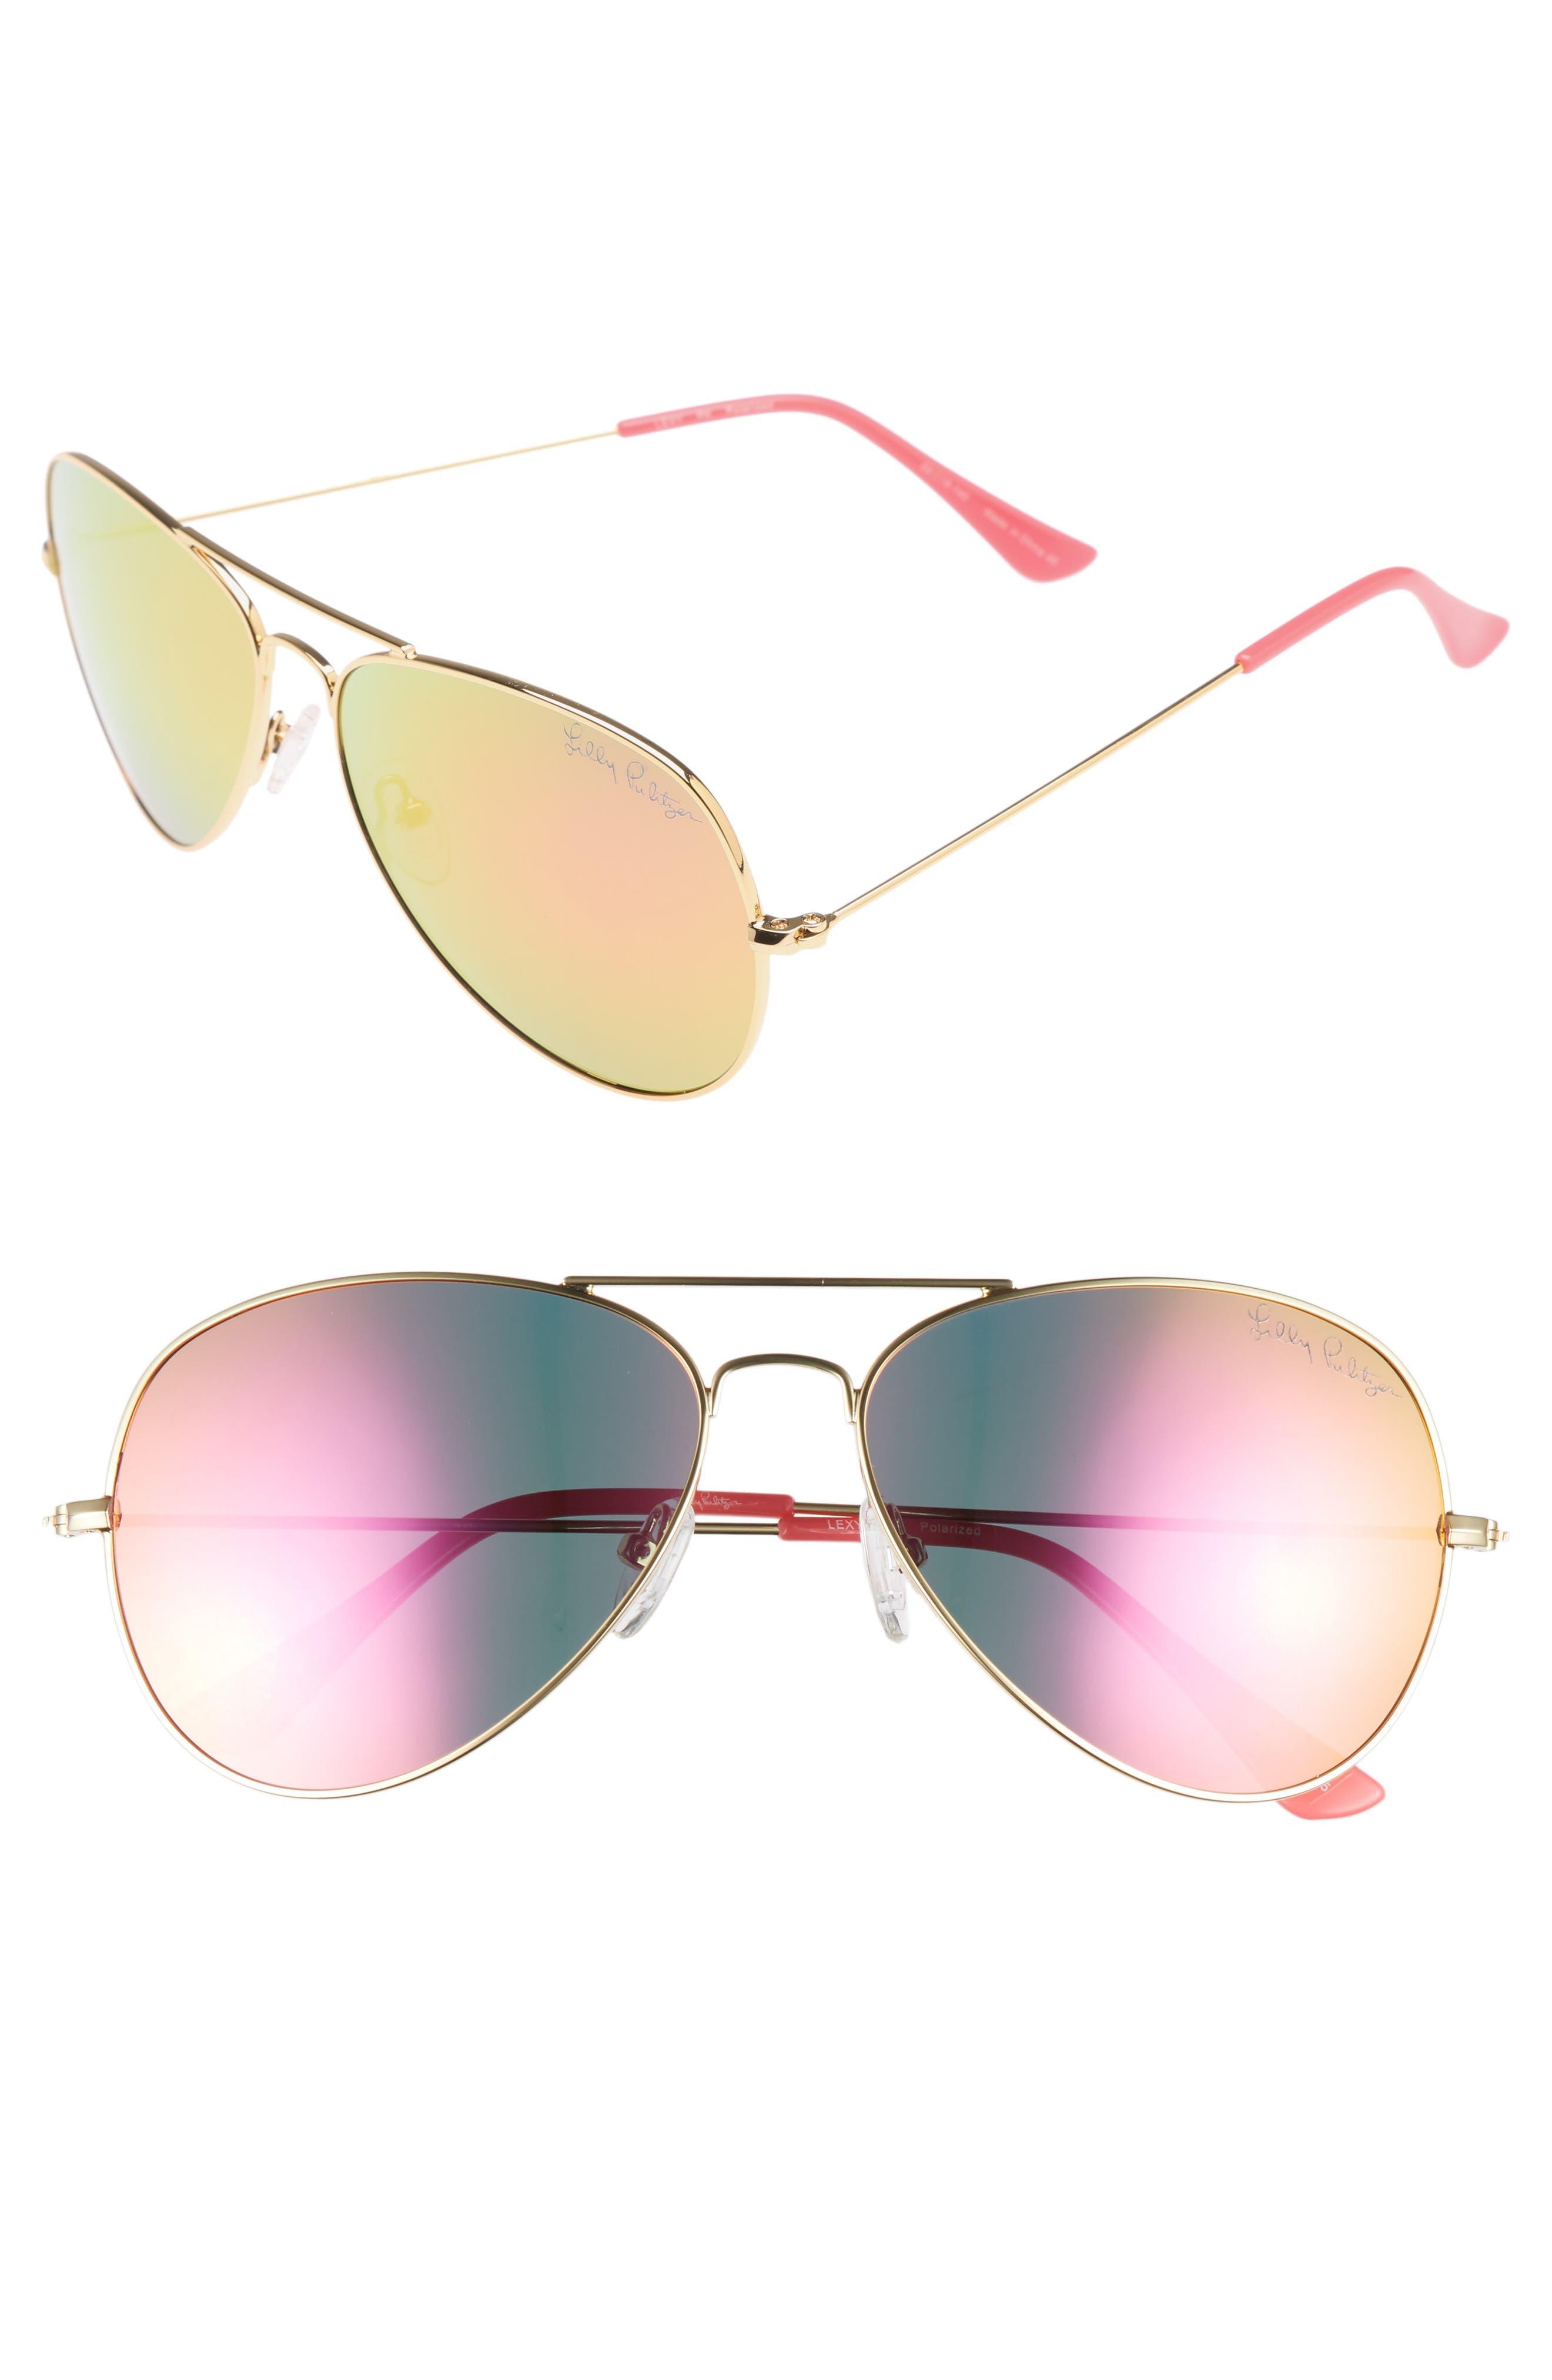 Lilly Pulitzer Lexy 5m Polarized Aviator Sunglasses - Hot Pink